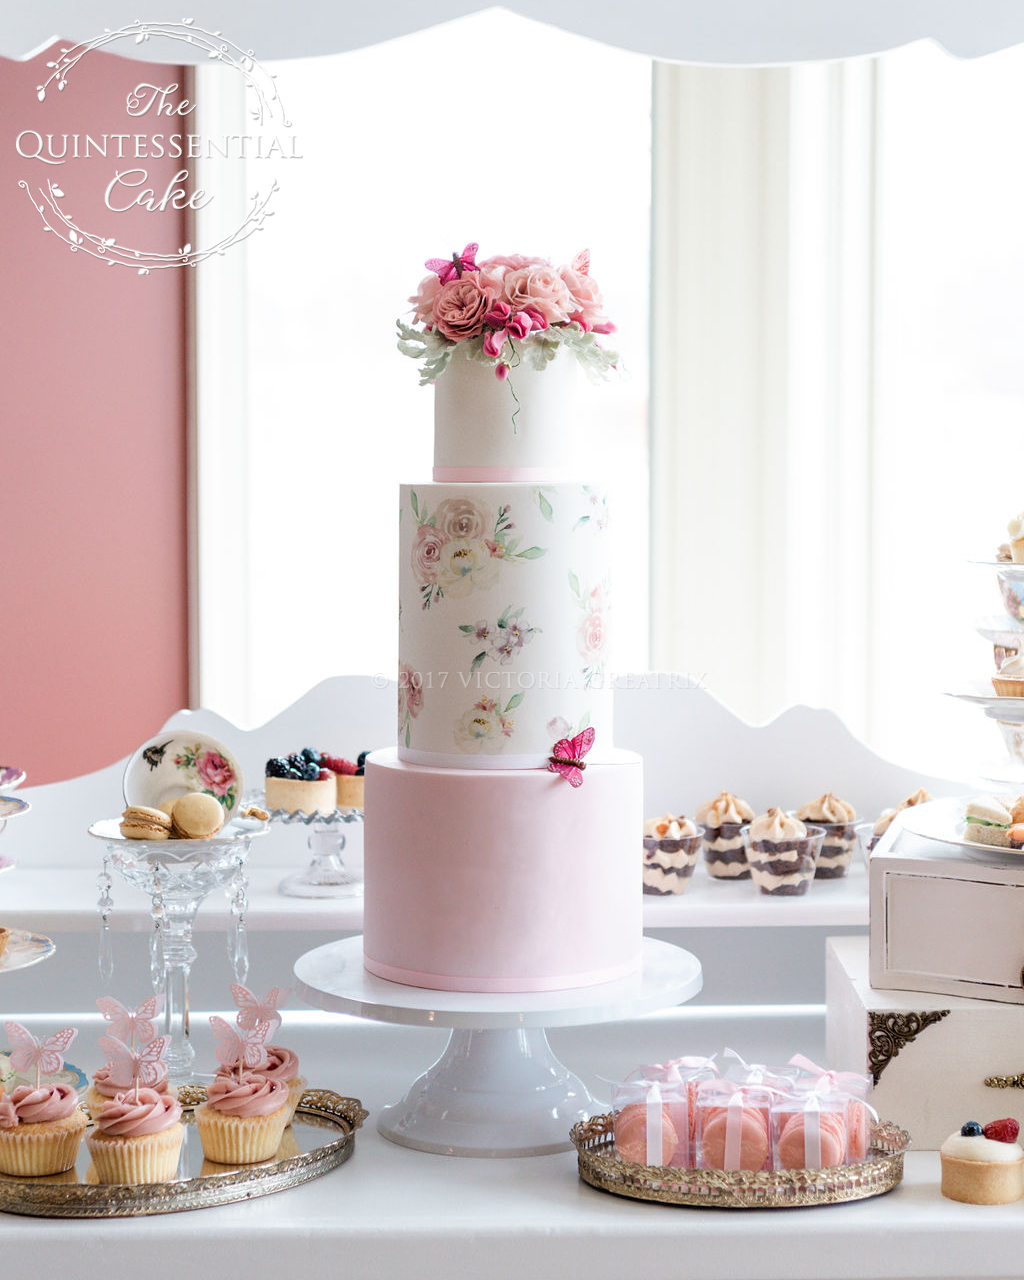 Marvelous Bridal Shower Tea Party Dessert Table The Quintessential Home Interior And Landscaping Pimpapssignezvosmurscom